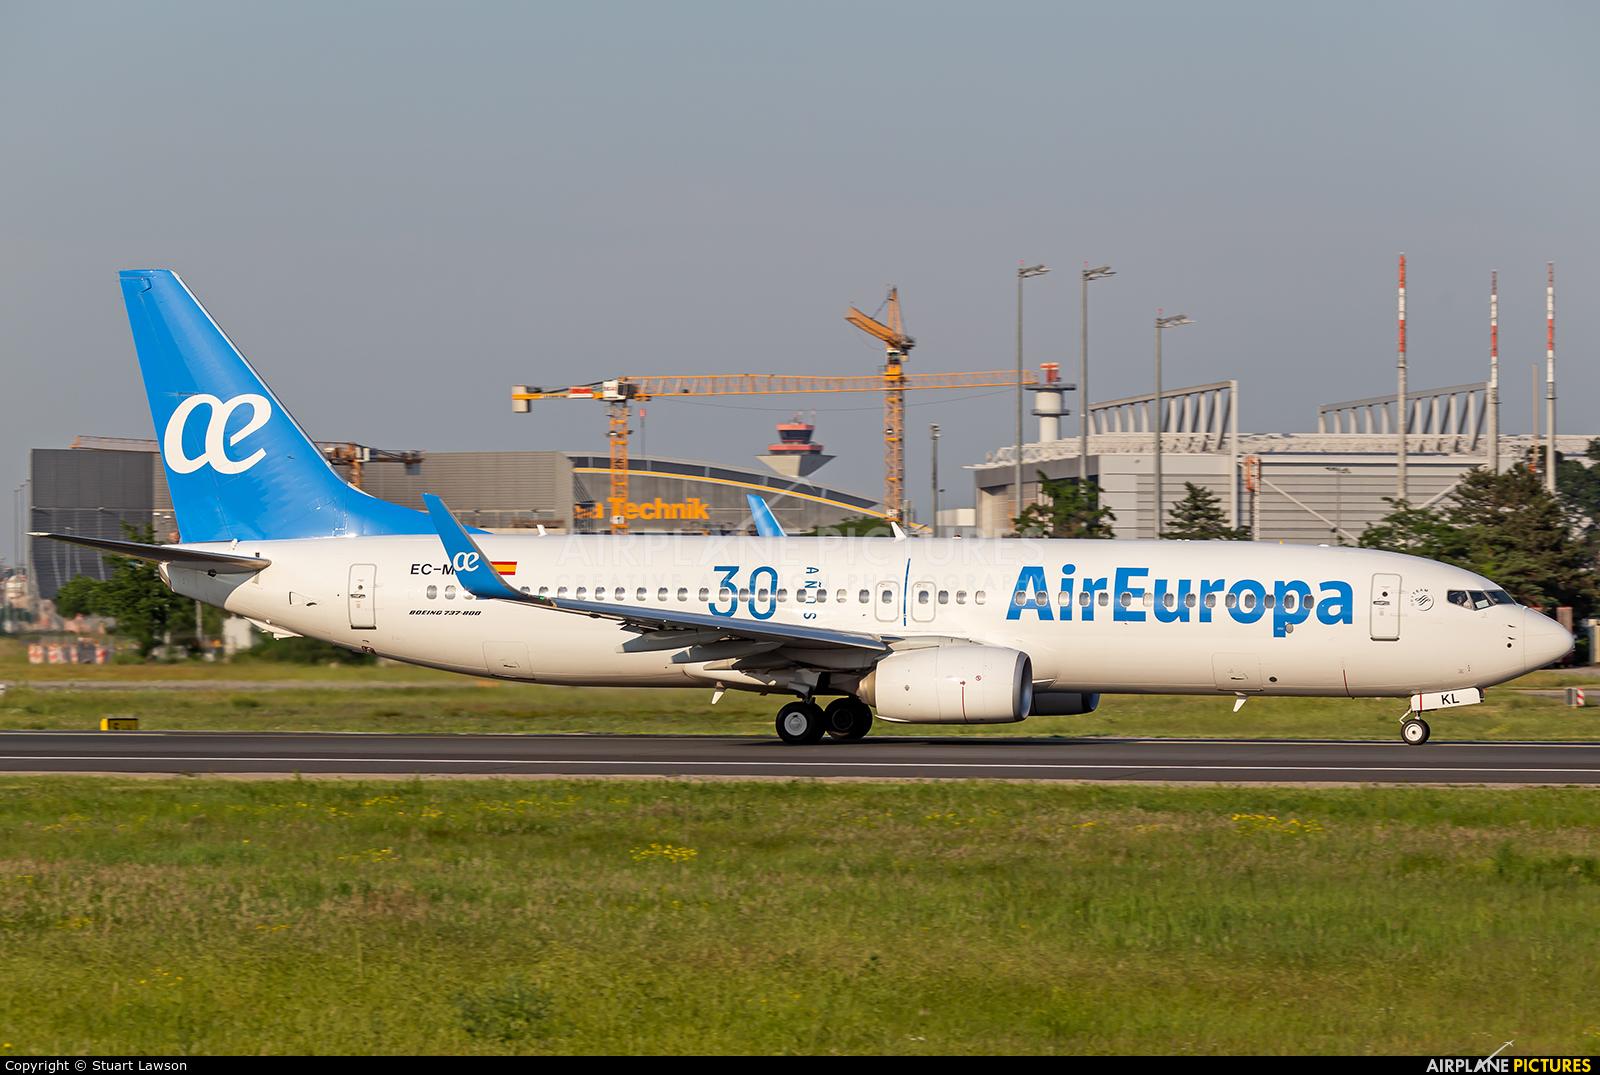 Air Europa EC-MKL aircraft at Frankfurt